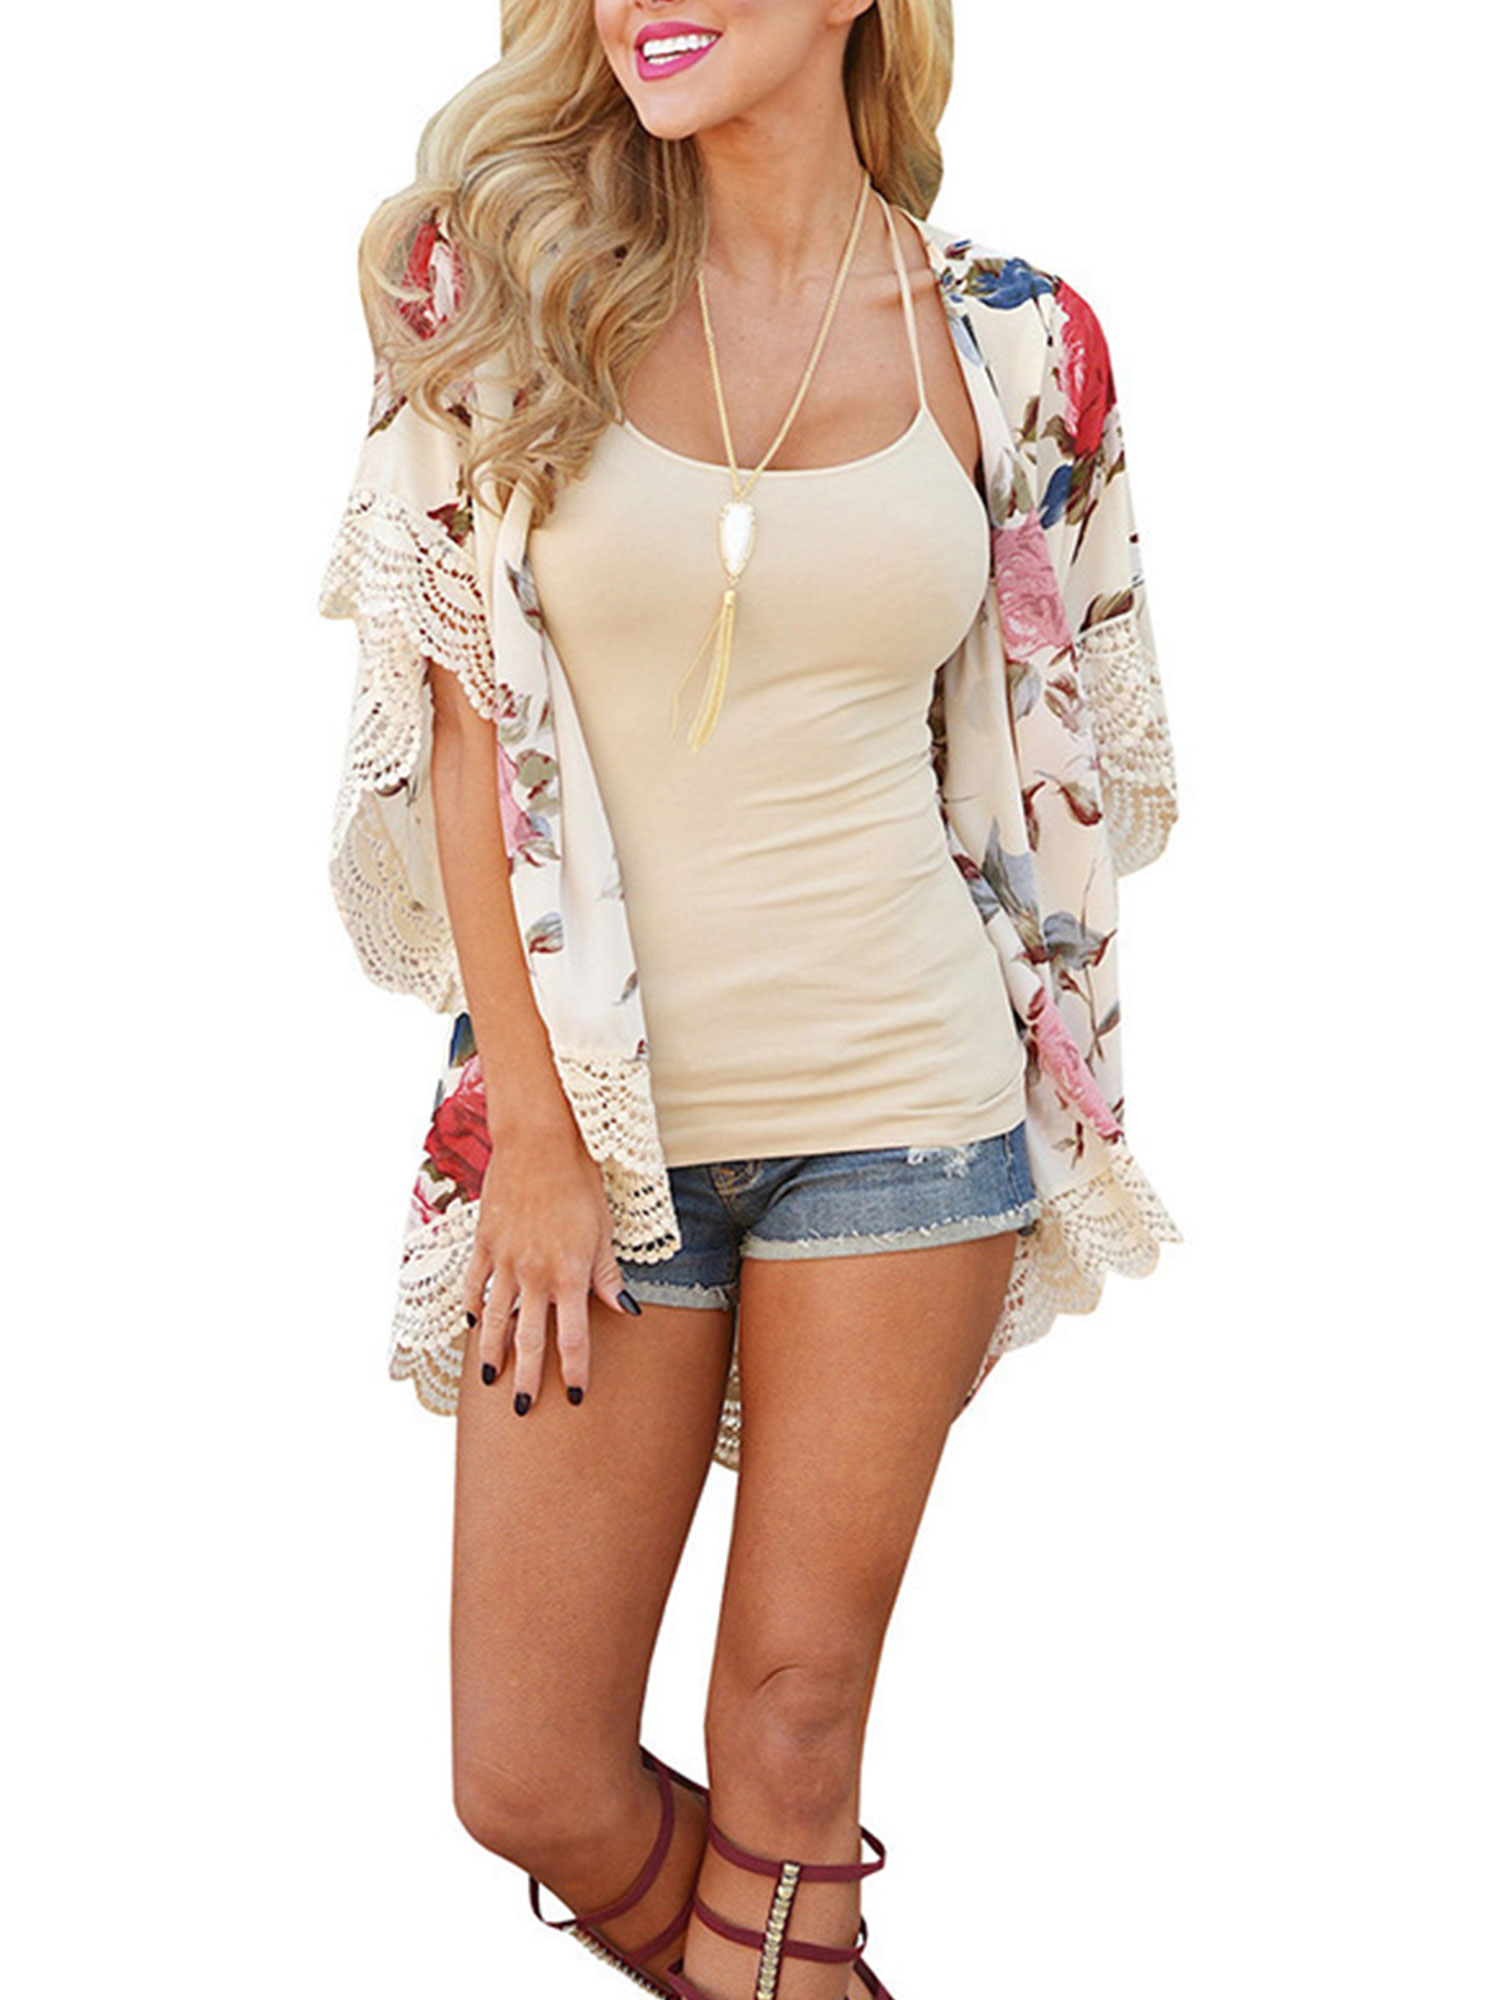 Women Chiffon Shawl Kimono Coat Cardigan Tops Floral Beach Cover Up Blouse Summer Beachwear Casual Loose Shirt